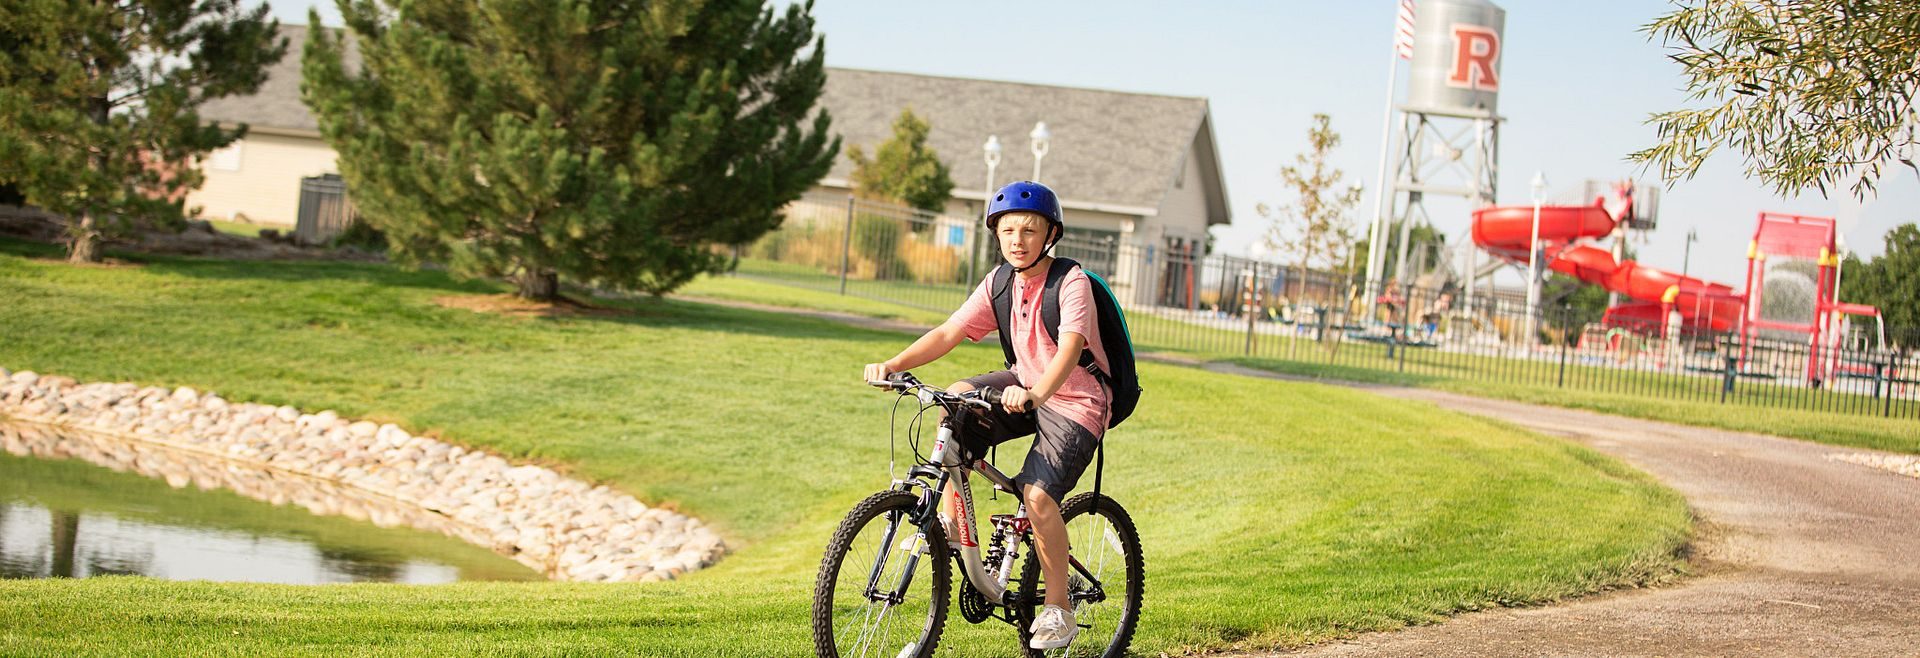 Reunion Lifestyle Bike Trails